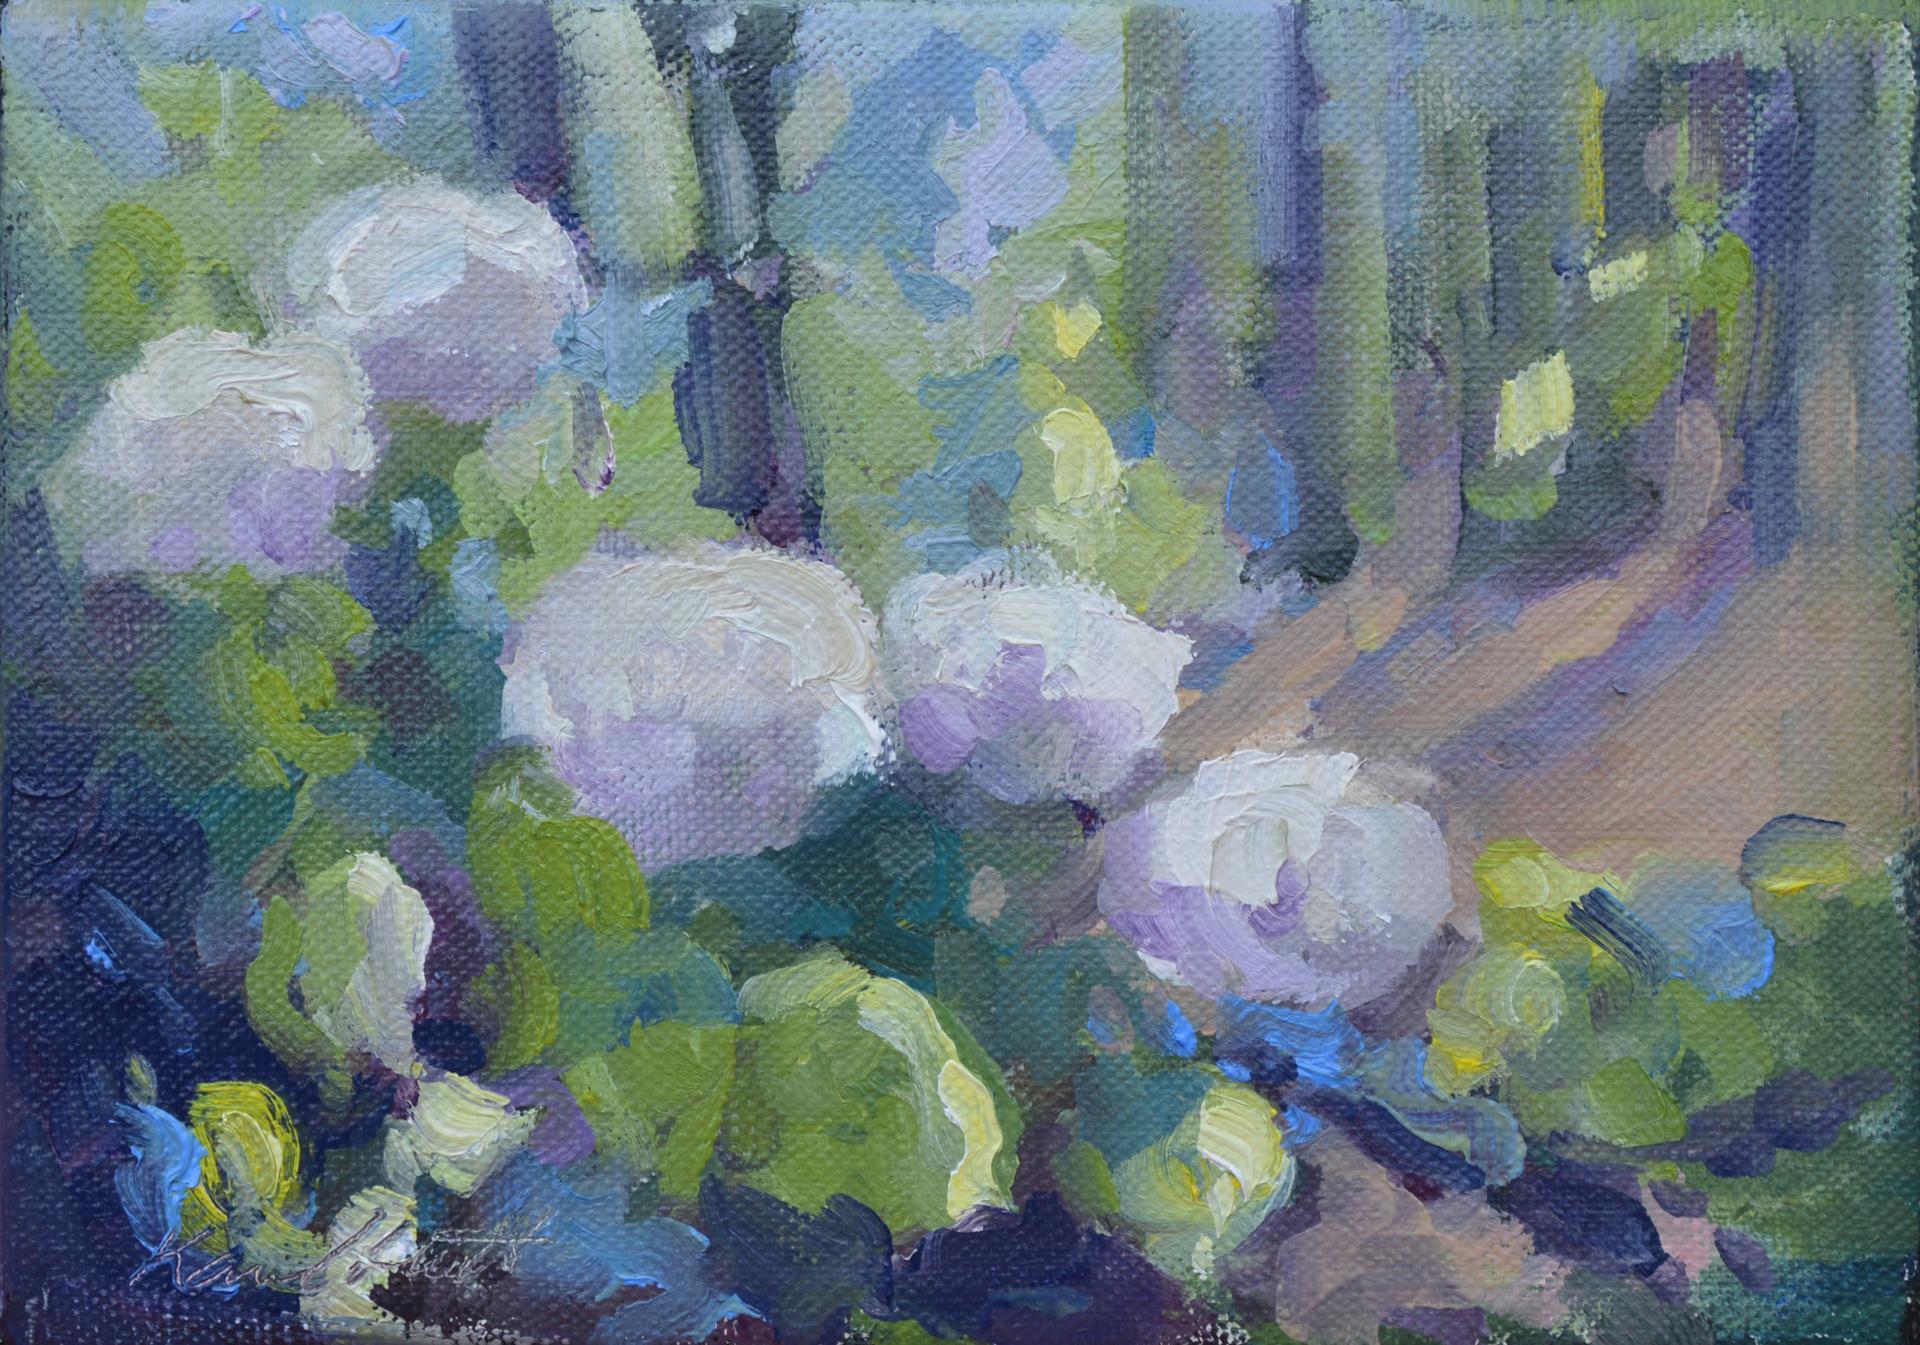 Hydrangeas in Sunlight by Karen Hewitt Hagan